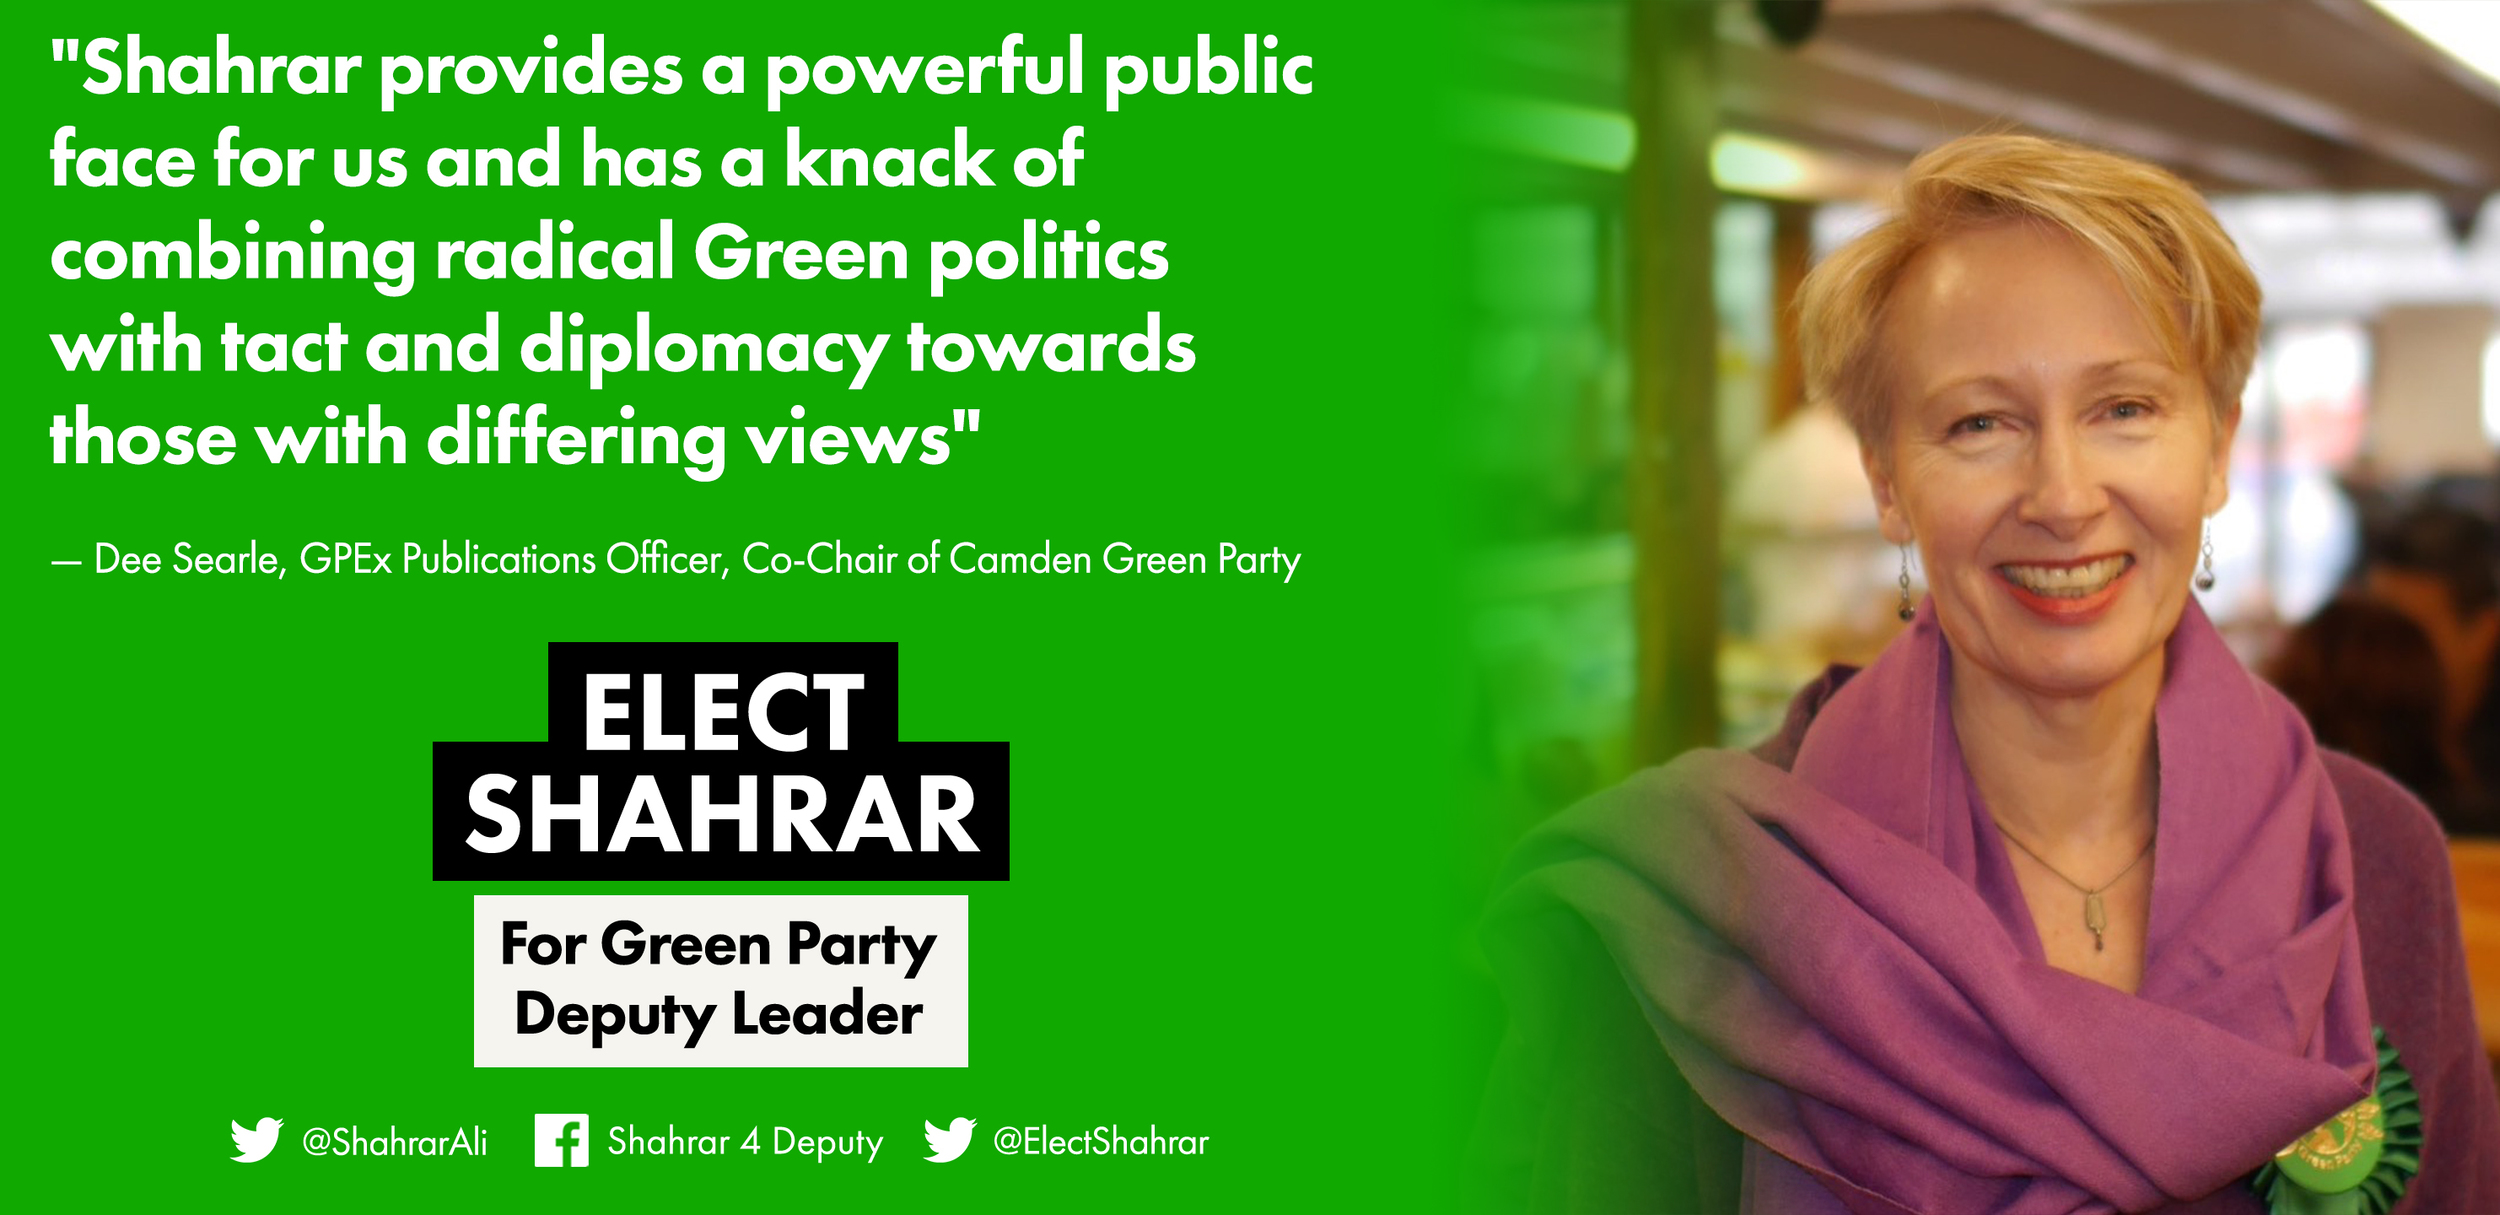 ElectShahrar Dee Searle Endorsement.jpg